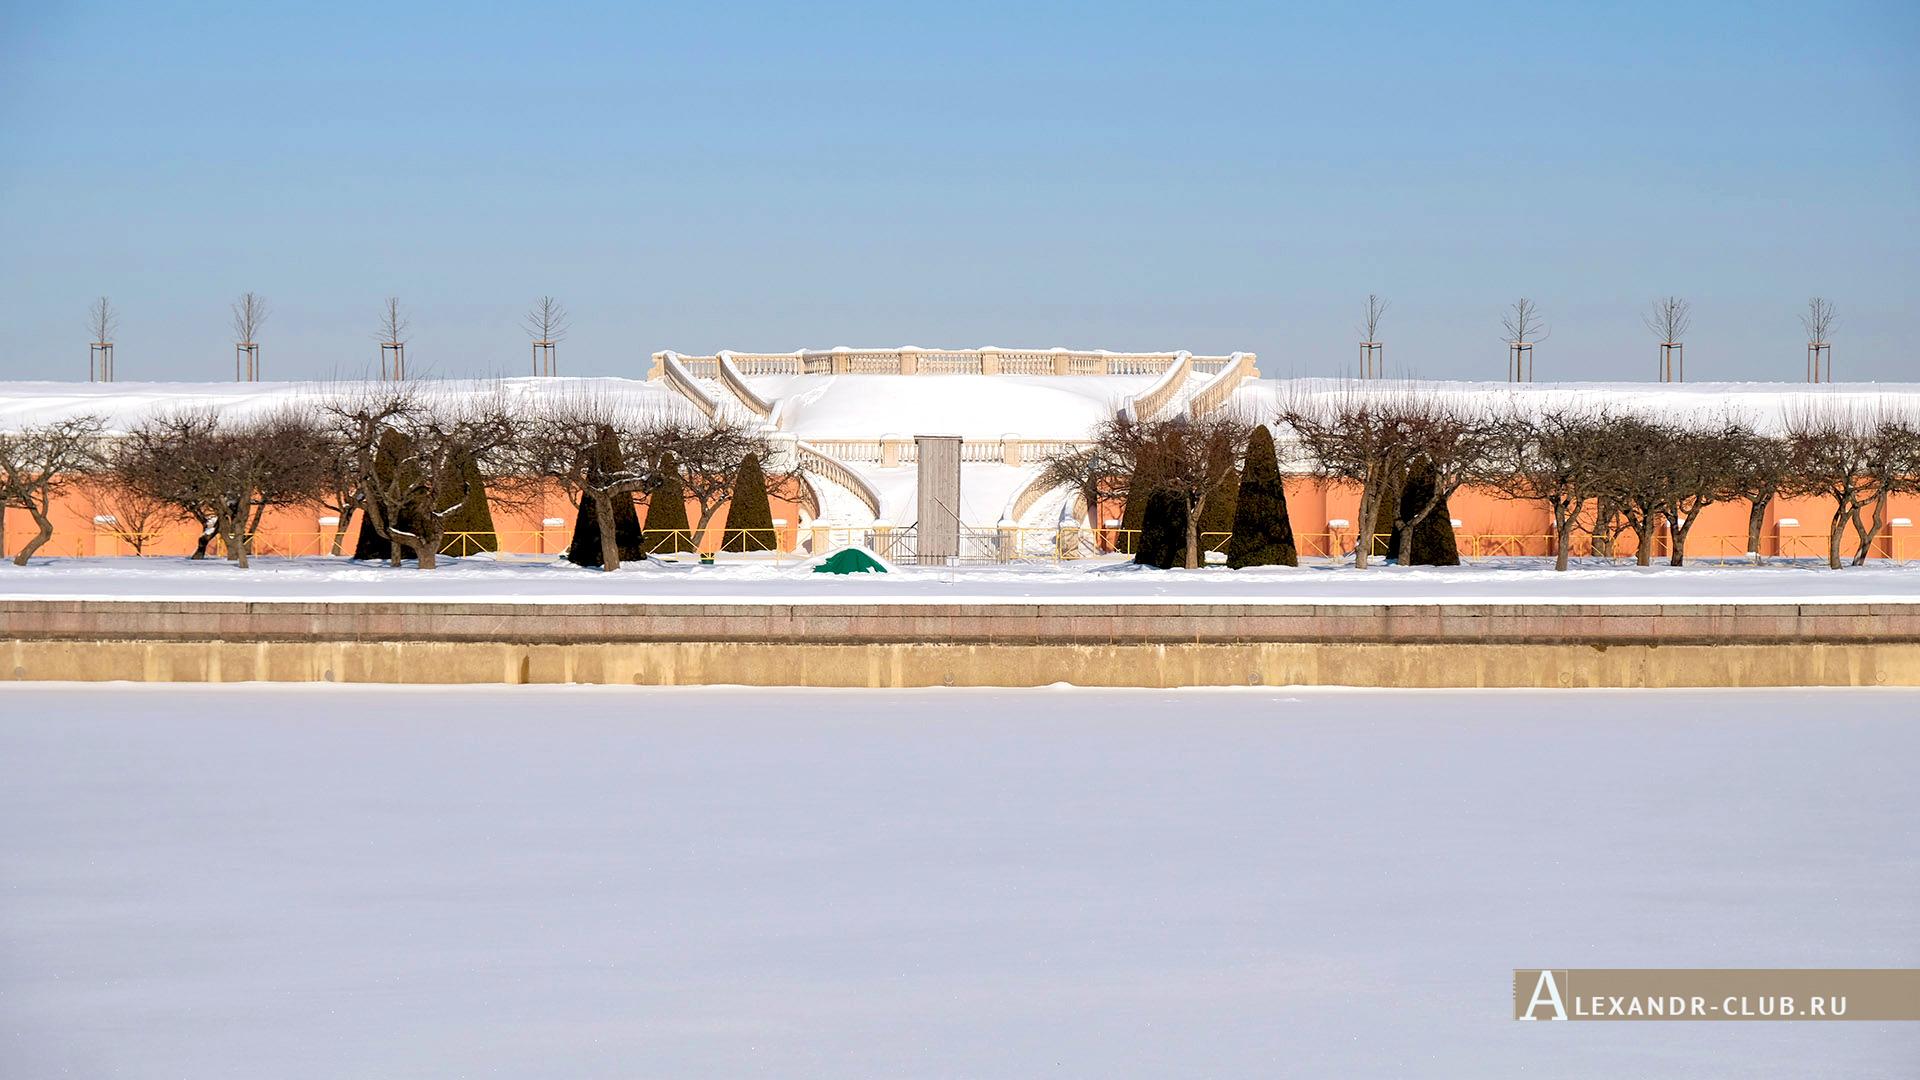 Петергоф, зима, Нижний парк, Марлинский пруд и Марлинский вал – 2